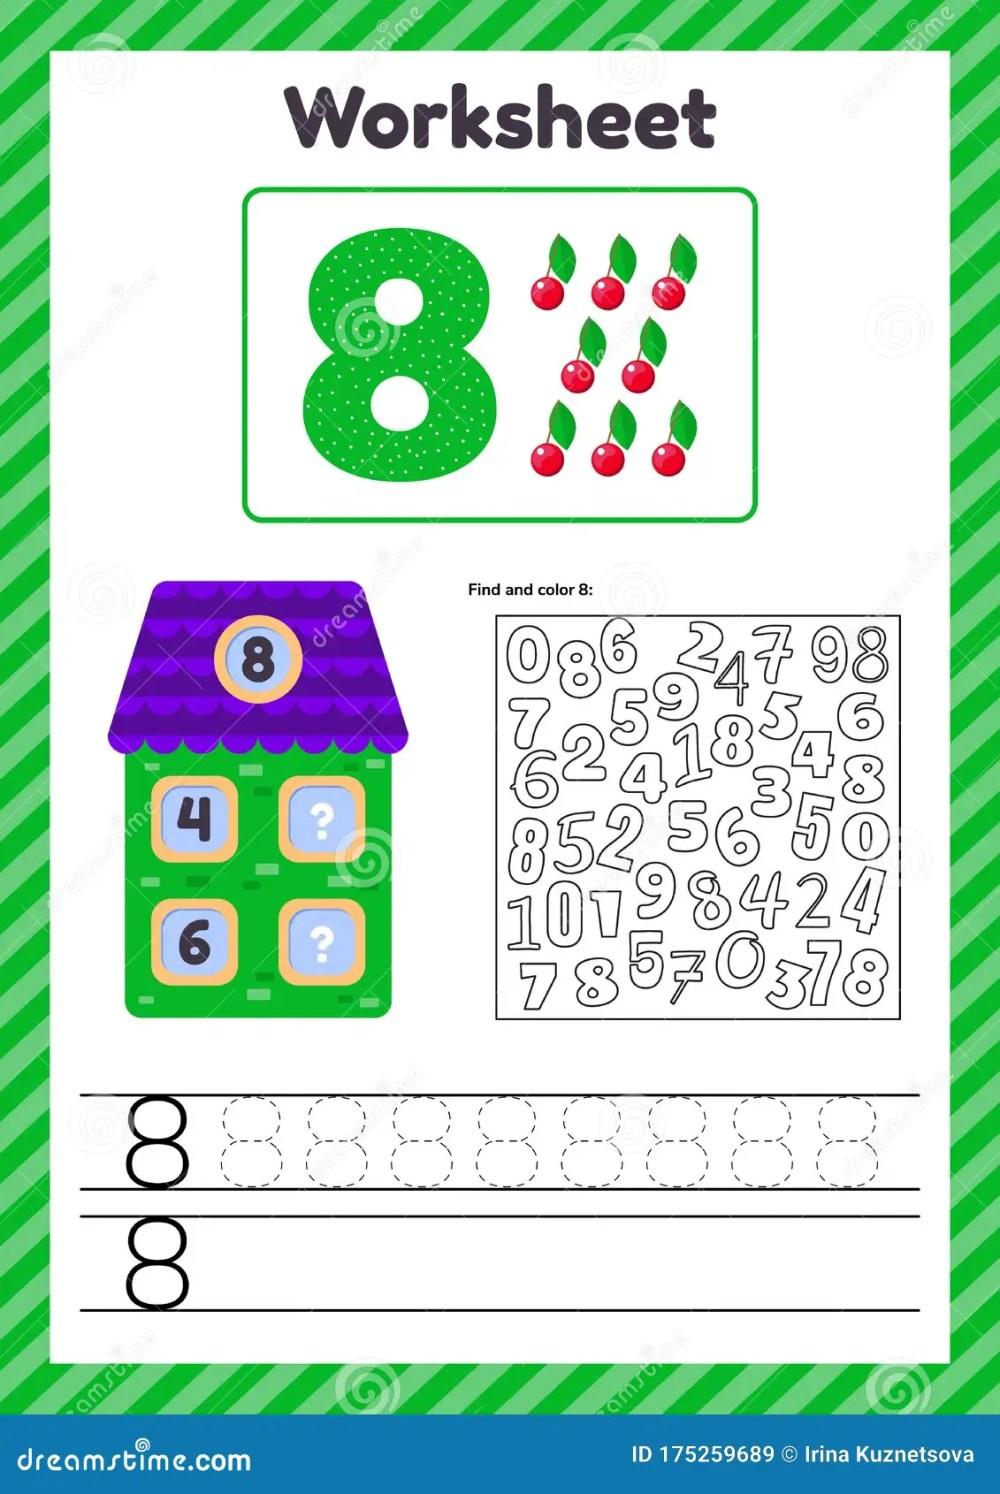 medium resolution of Worksheet Count For Kids. House. Number Bonds. Trace Line. The Study Of  Mathematics For Children Of Kindergarten Stock Vector - Illustration of line